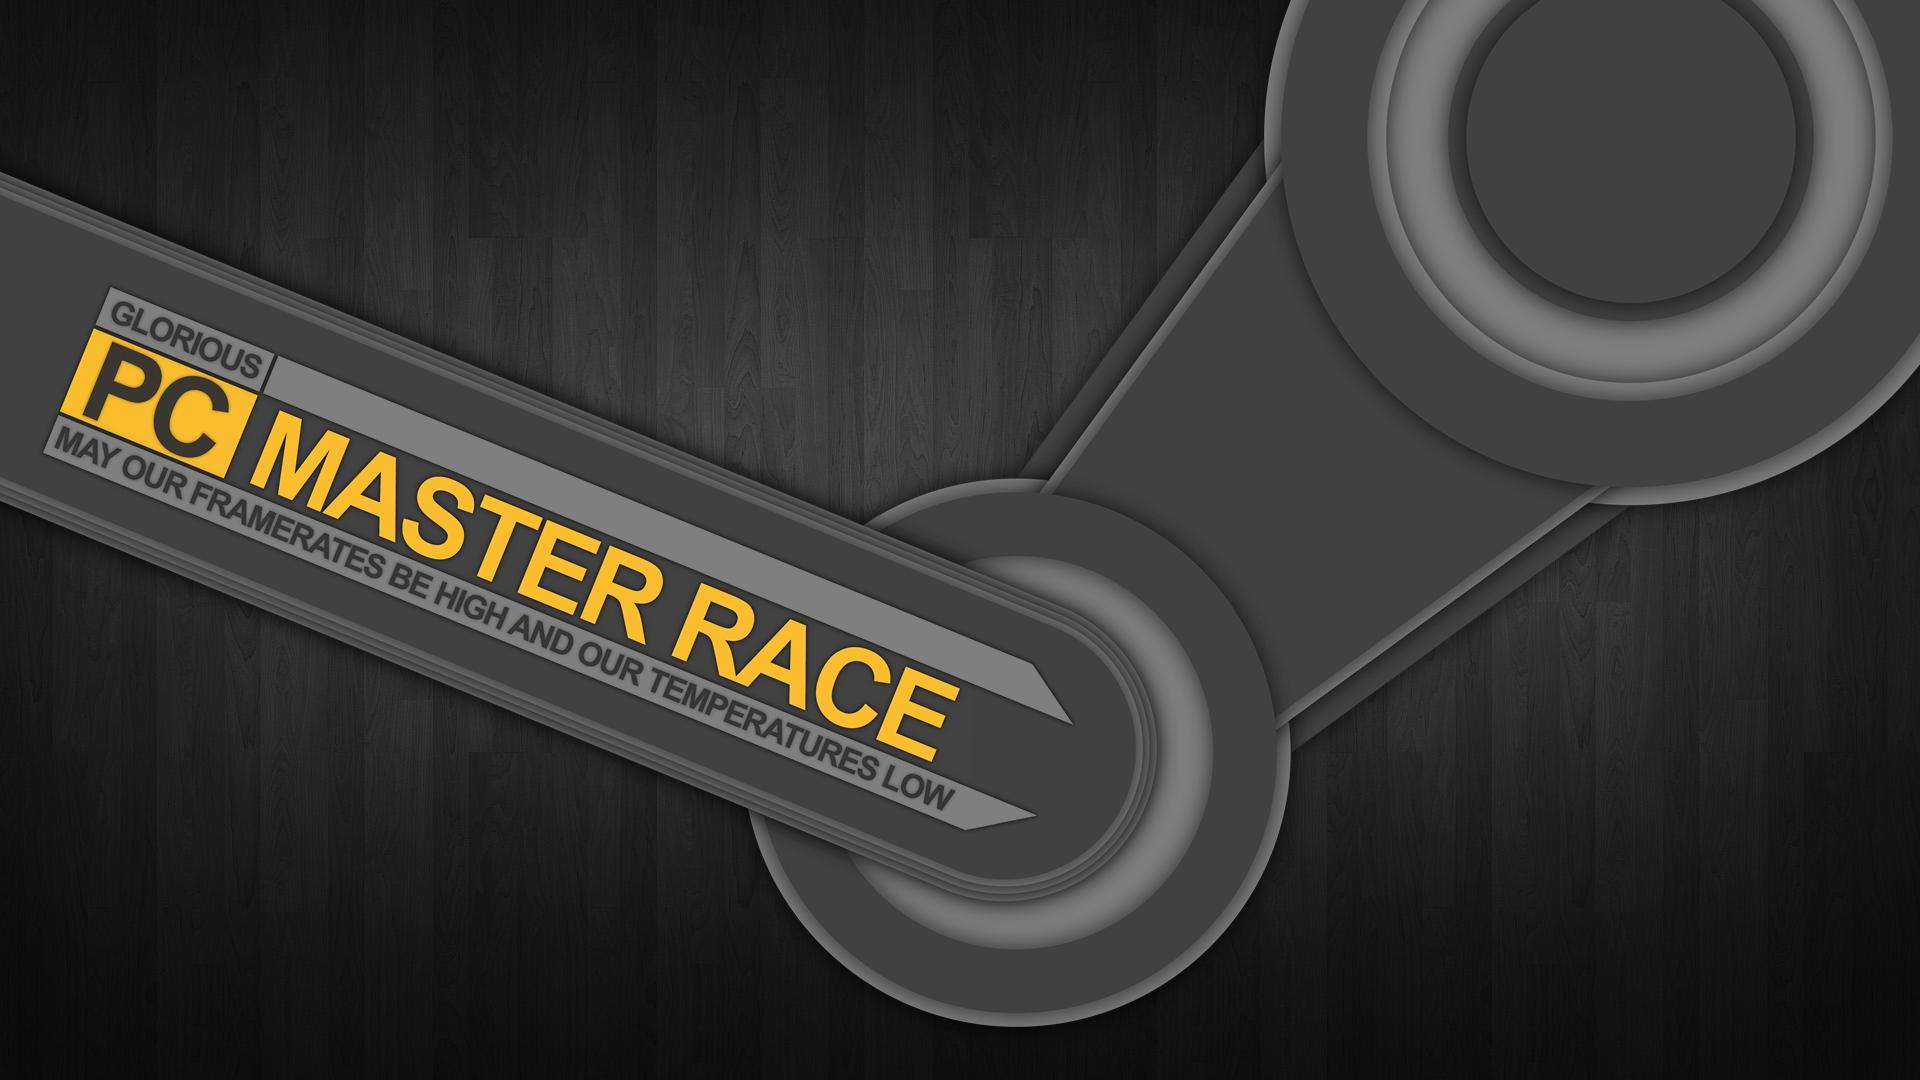 pc master race full hd fond d'écran and arrière-plan | 1920x1080